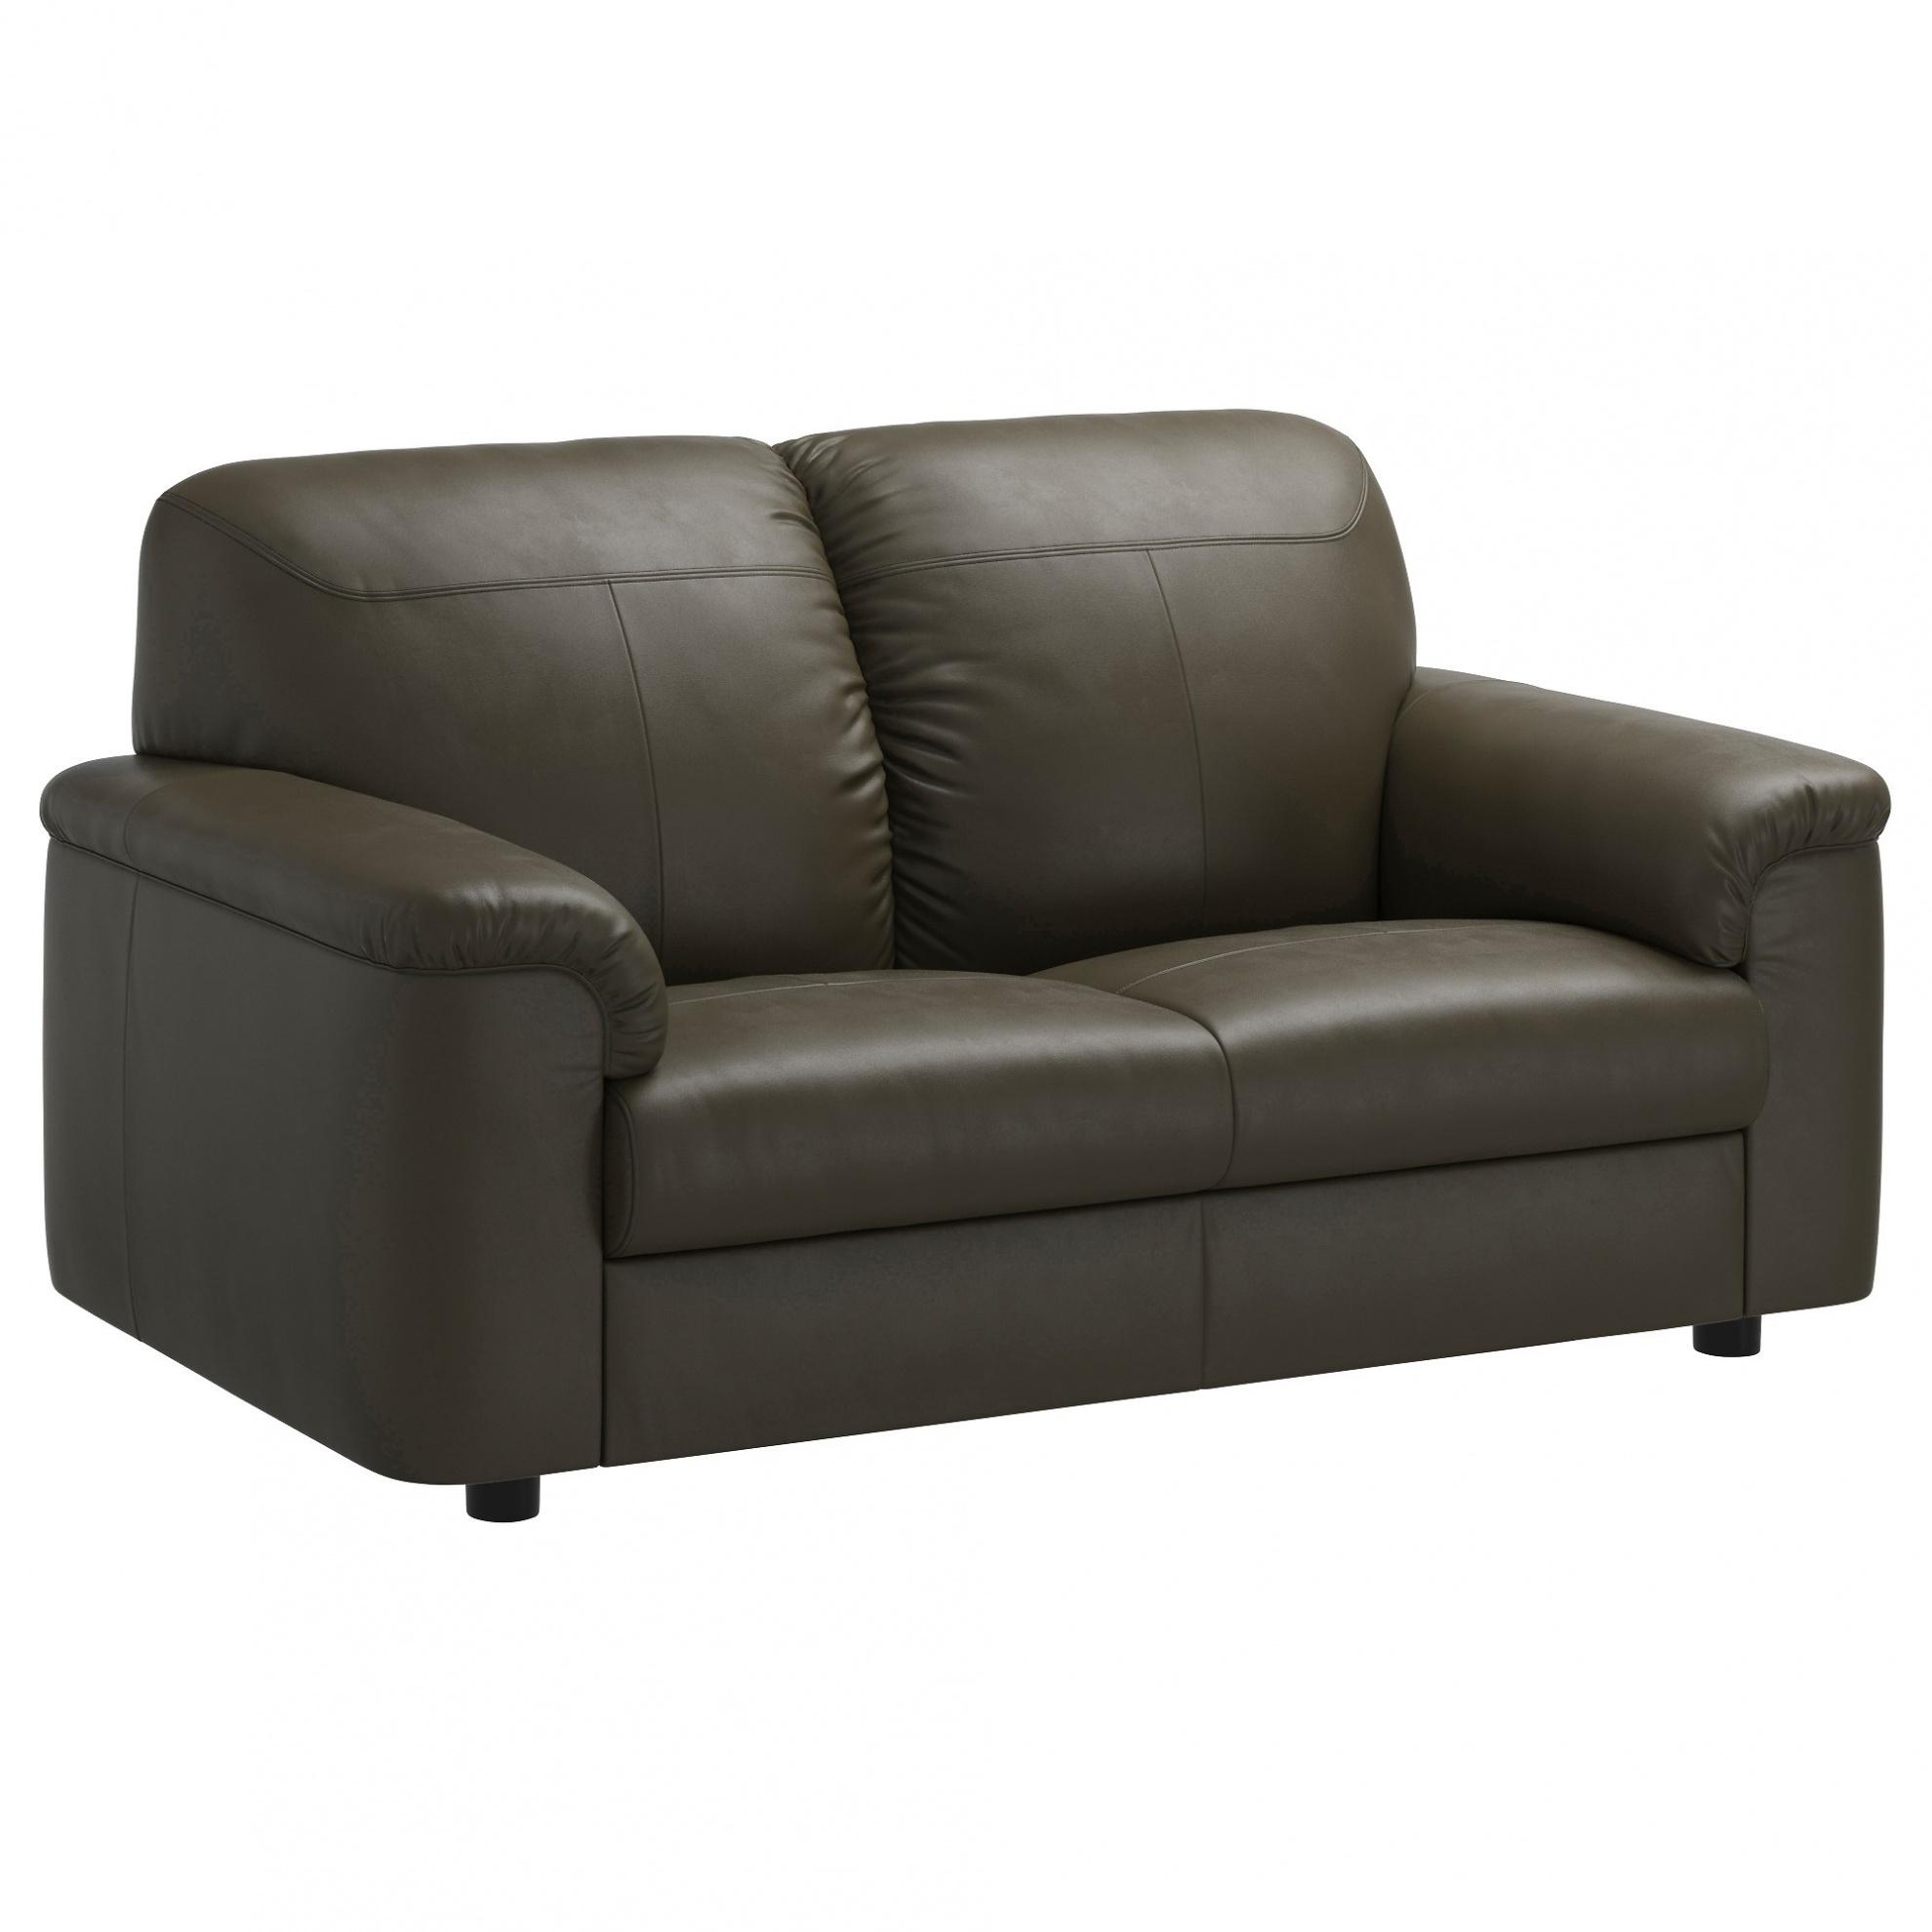 Canape Tissu Ikea Inspirant Stock Canapé Lit 3 Places Centralillaw